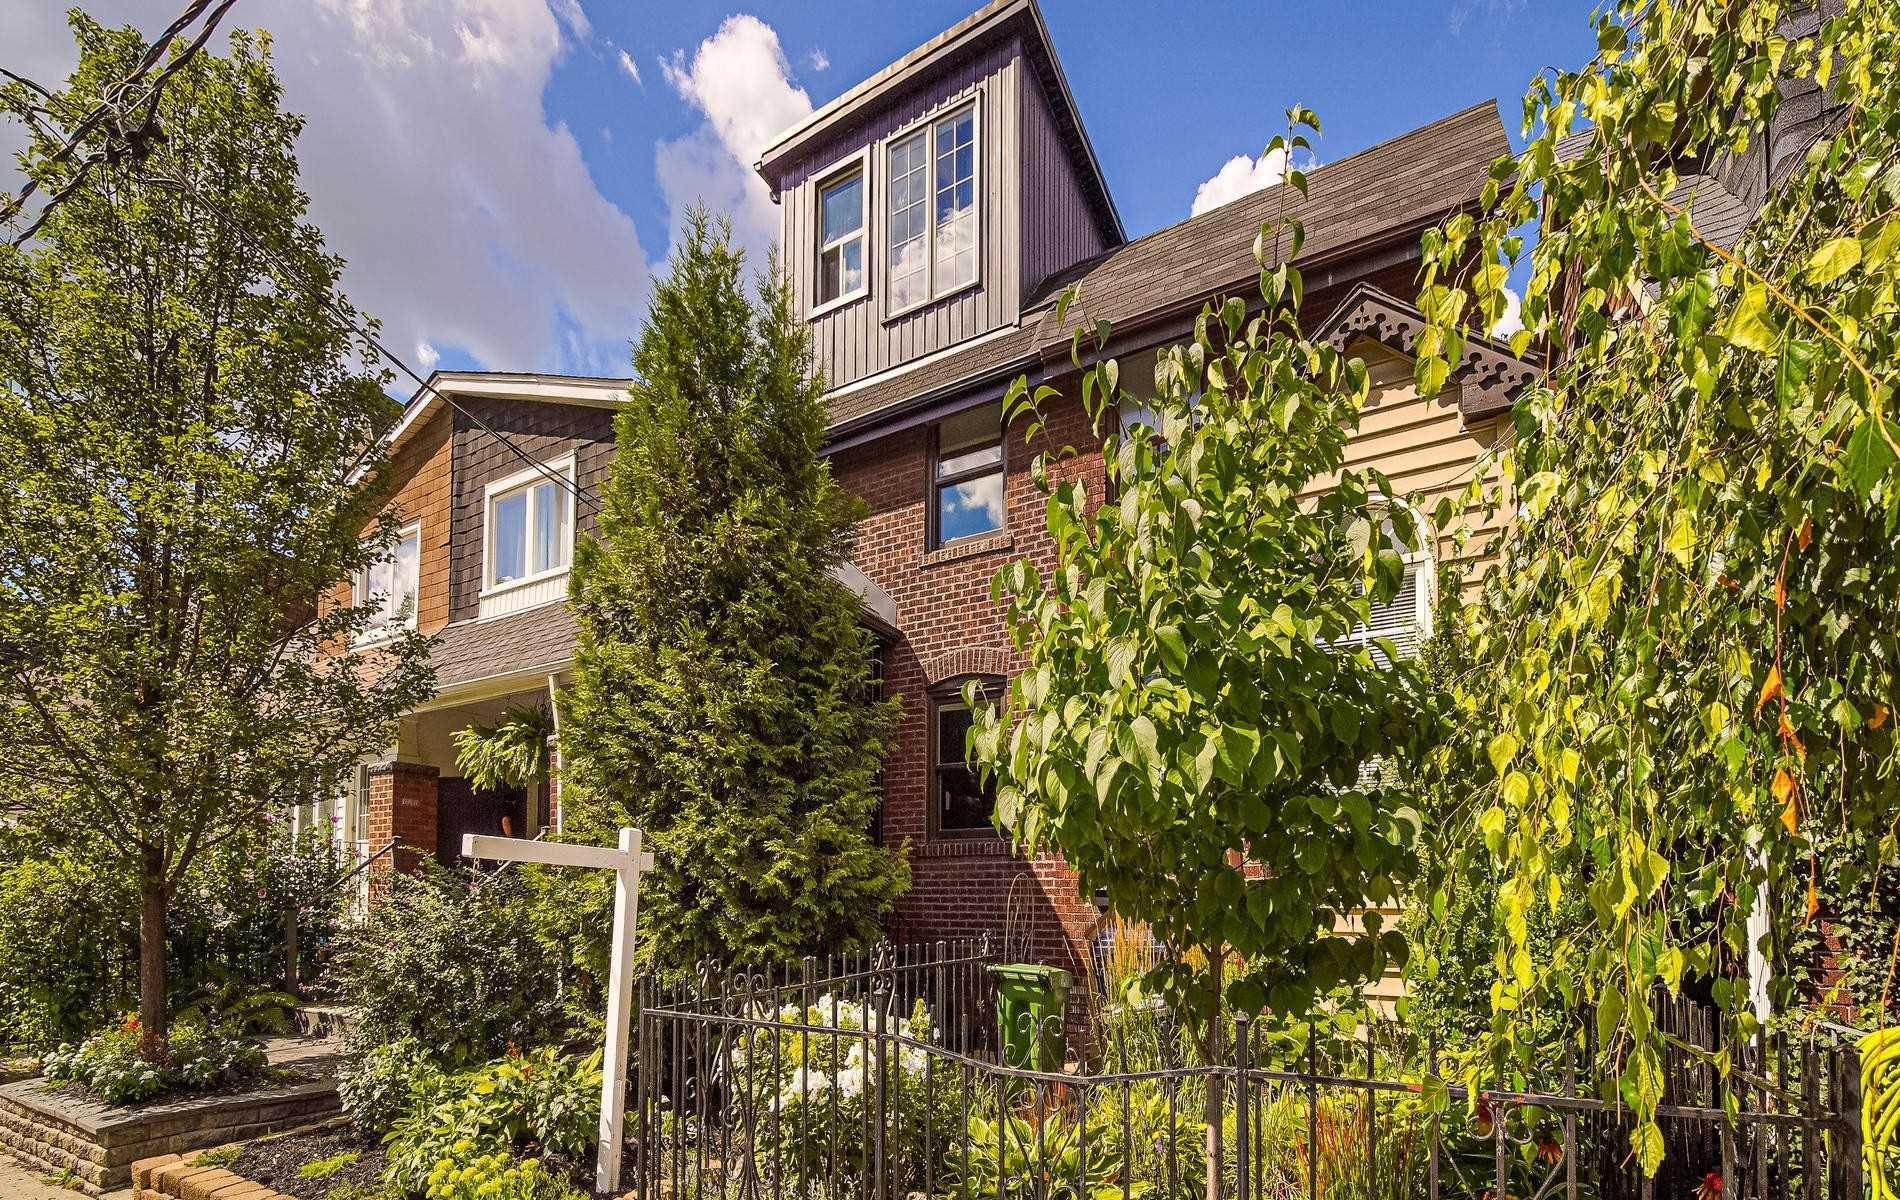 Main Photo: 212 Logan Avenue in Toronto: South Riverdale House (3-Storey) for sale (Toronto E01)  : MLS®# E4877195